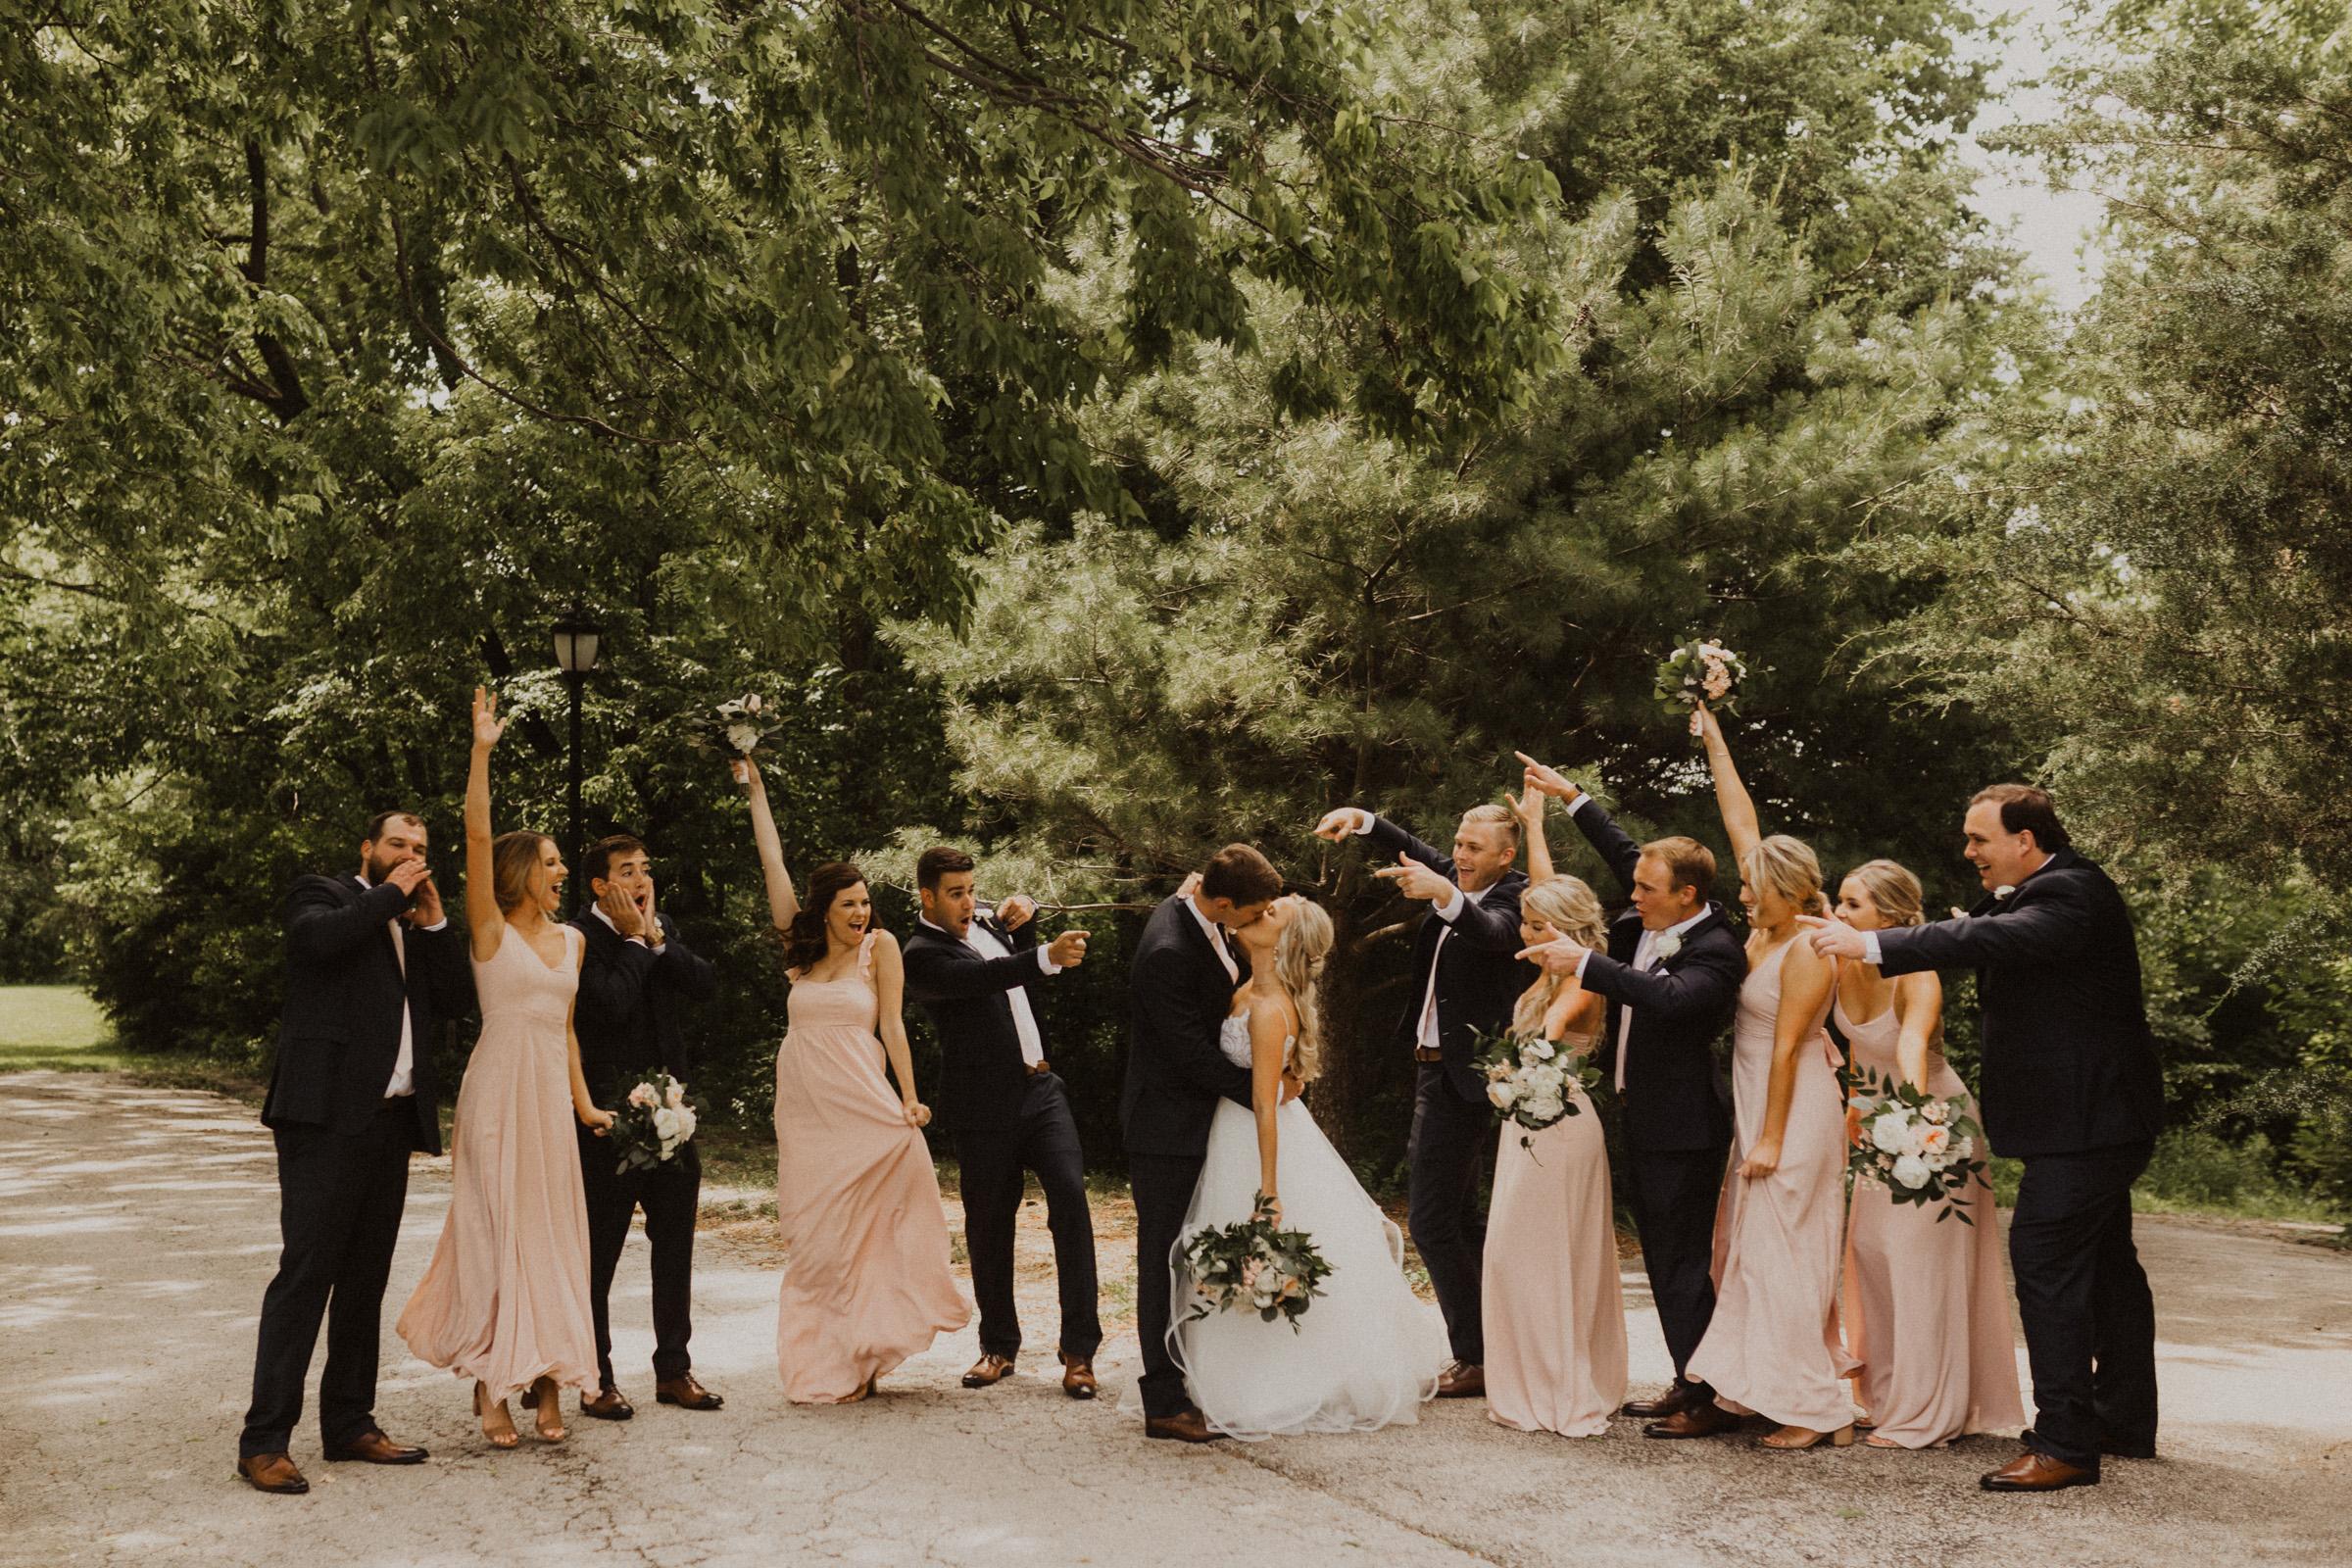 alyssa barletter photography hawthorne house summer outdoor wedding southern charm inspiration-25.jpg